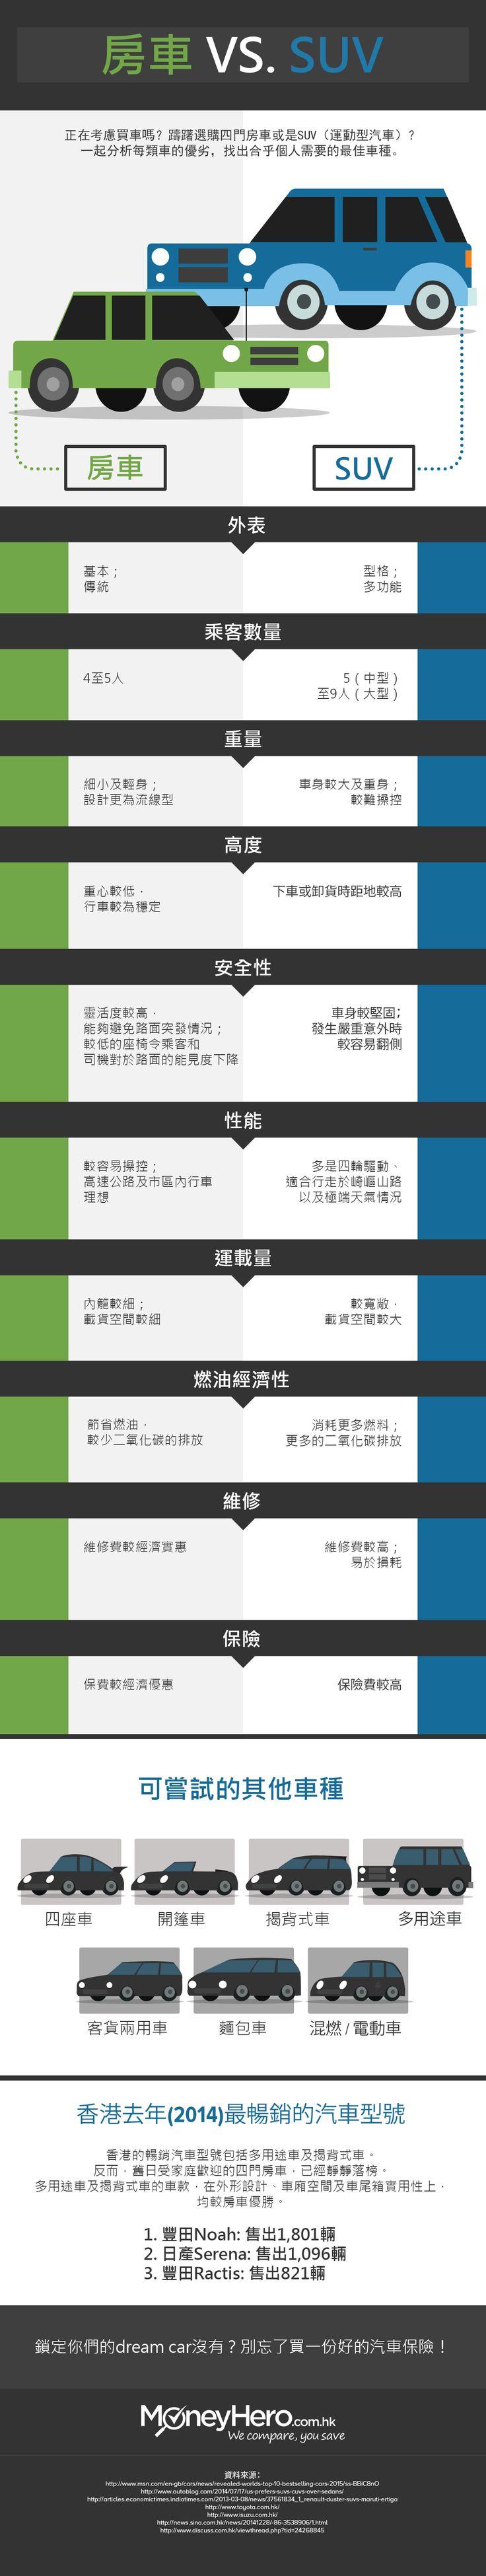 #car #car insurance #sedan #SUV #driver #hong kong #toyota #nissan #models